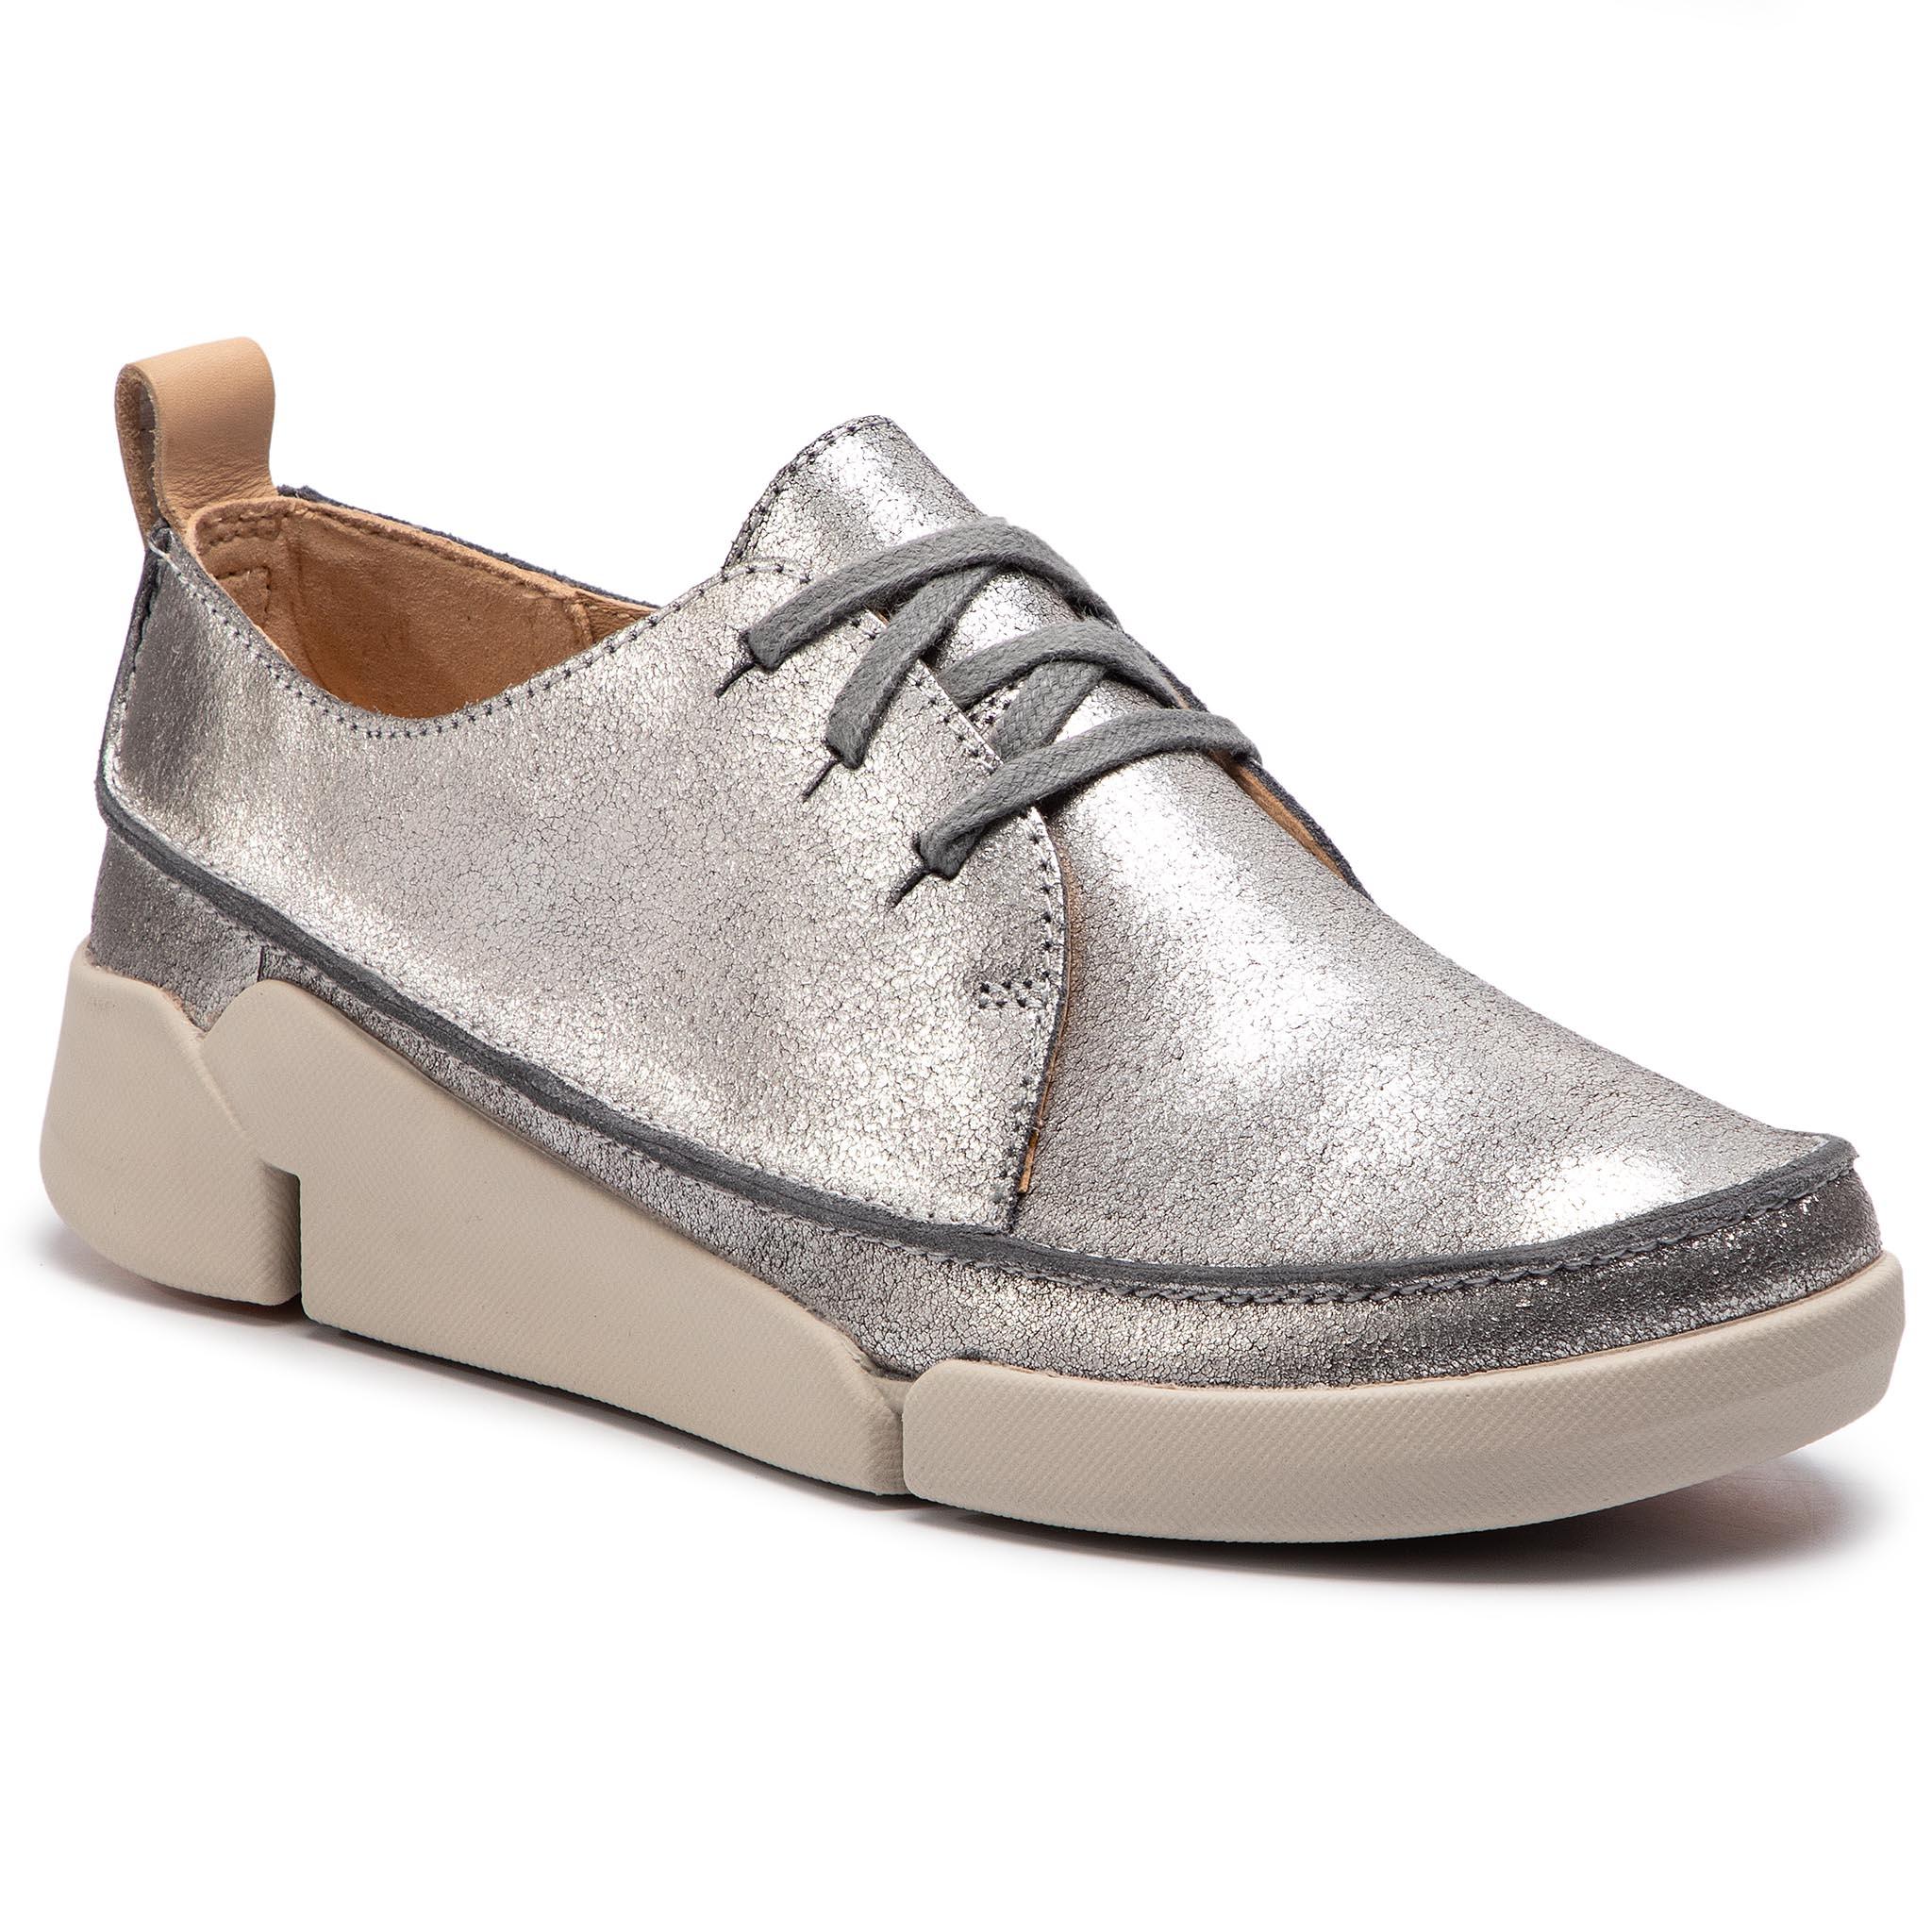 5741a9d988 Félcipő CLARKS - Tri Clara 261388984 Silver Metallic - Glami.hu